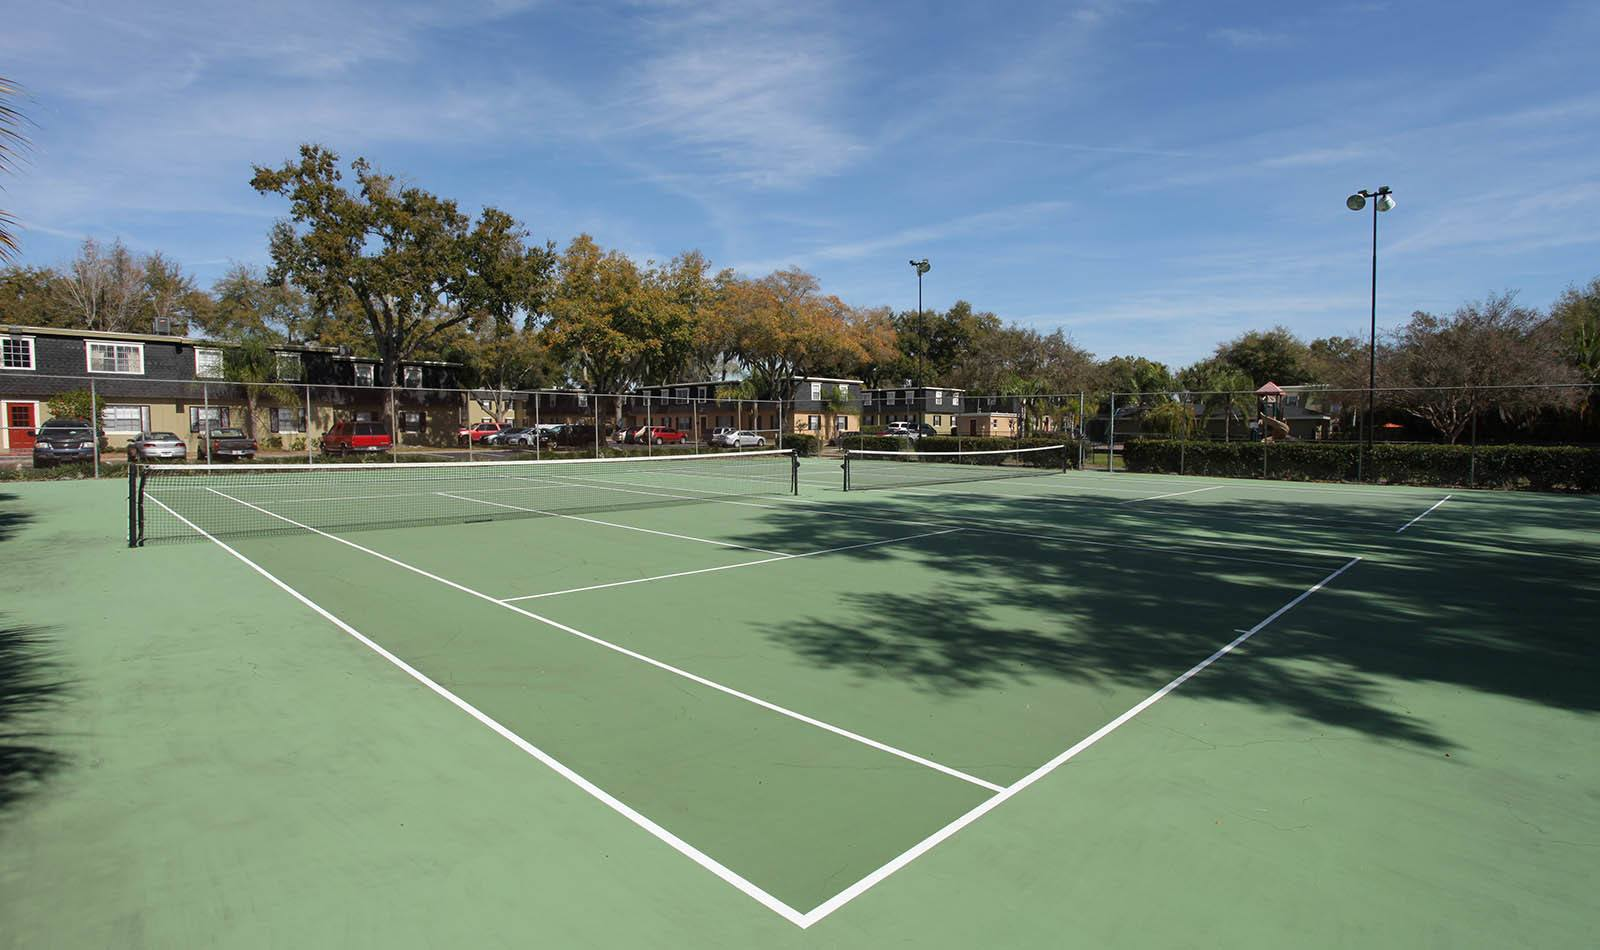 Tennis court at Briarcrest at Winter Haven in Winter Haven, FL